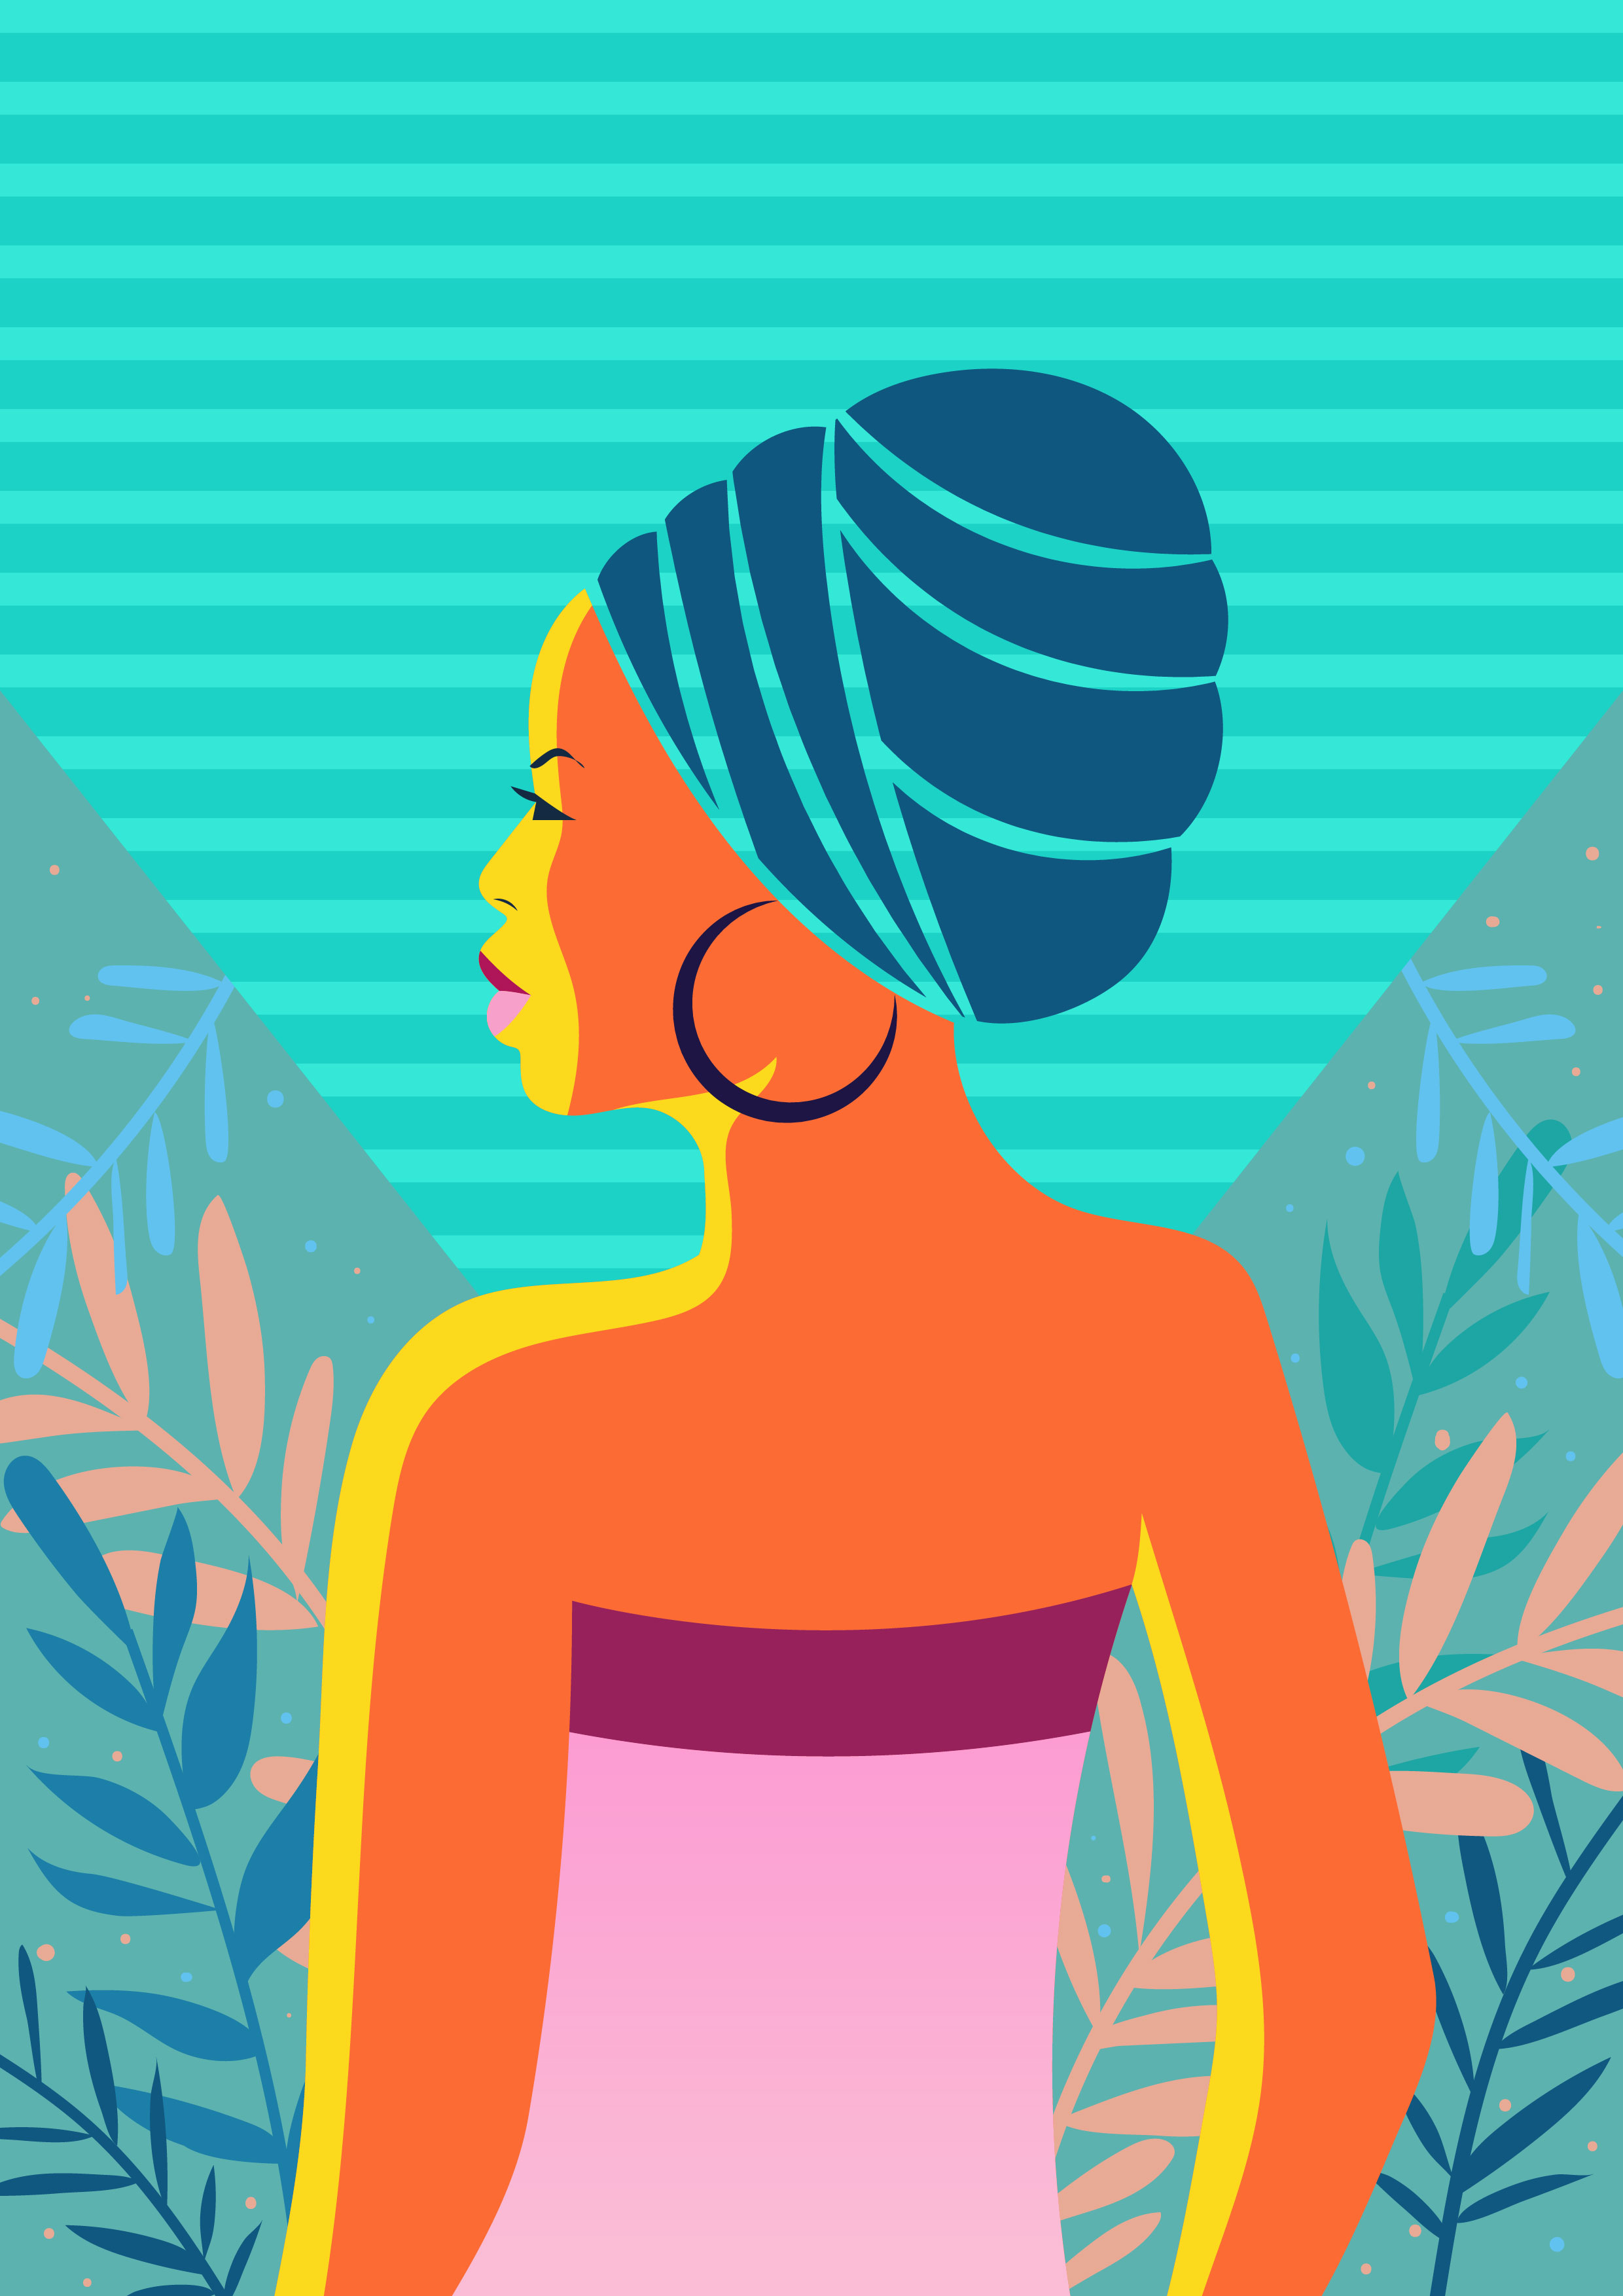 Women Of Color Illustration - Download Free Vector Art, Stock ...